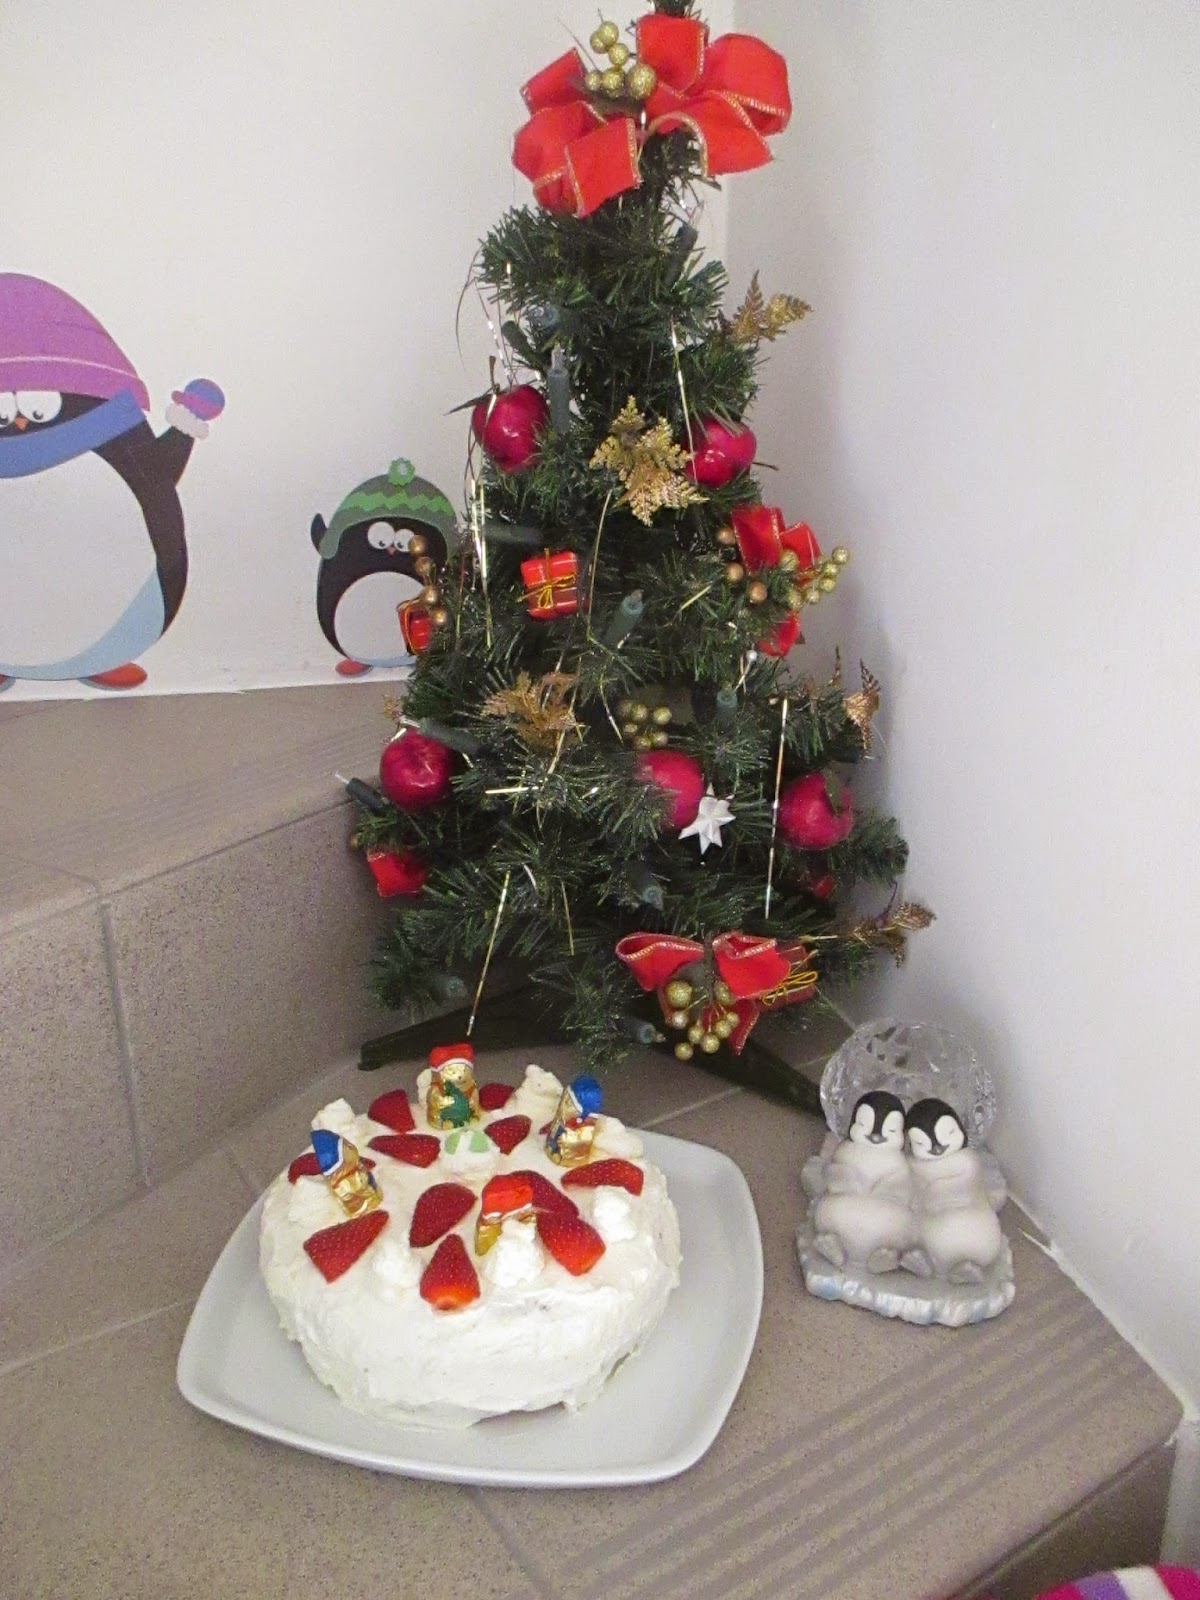 Otaku Family: Kurisumasukēki - Japanische Weihnachtstorte